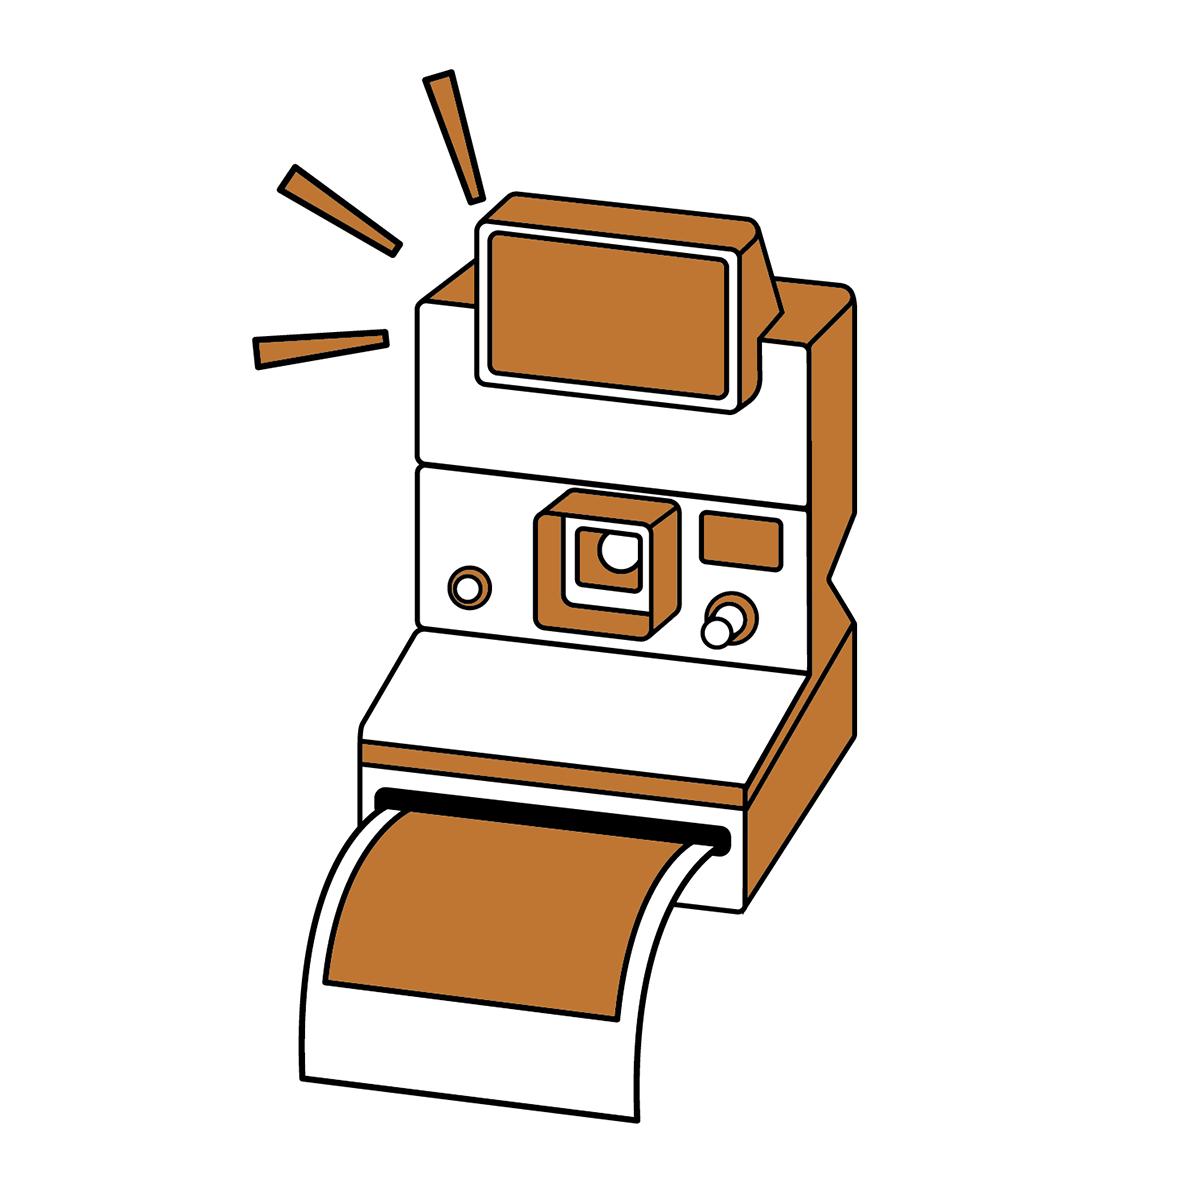 TAM87031 - Maskeringsteip med dispenser, 10 mm